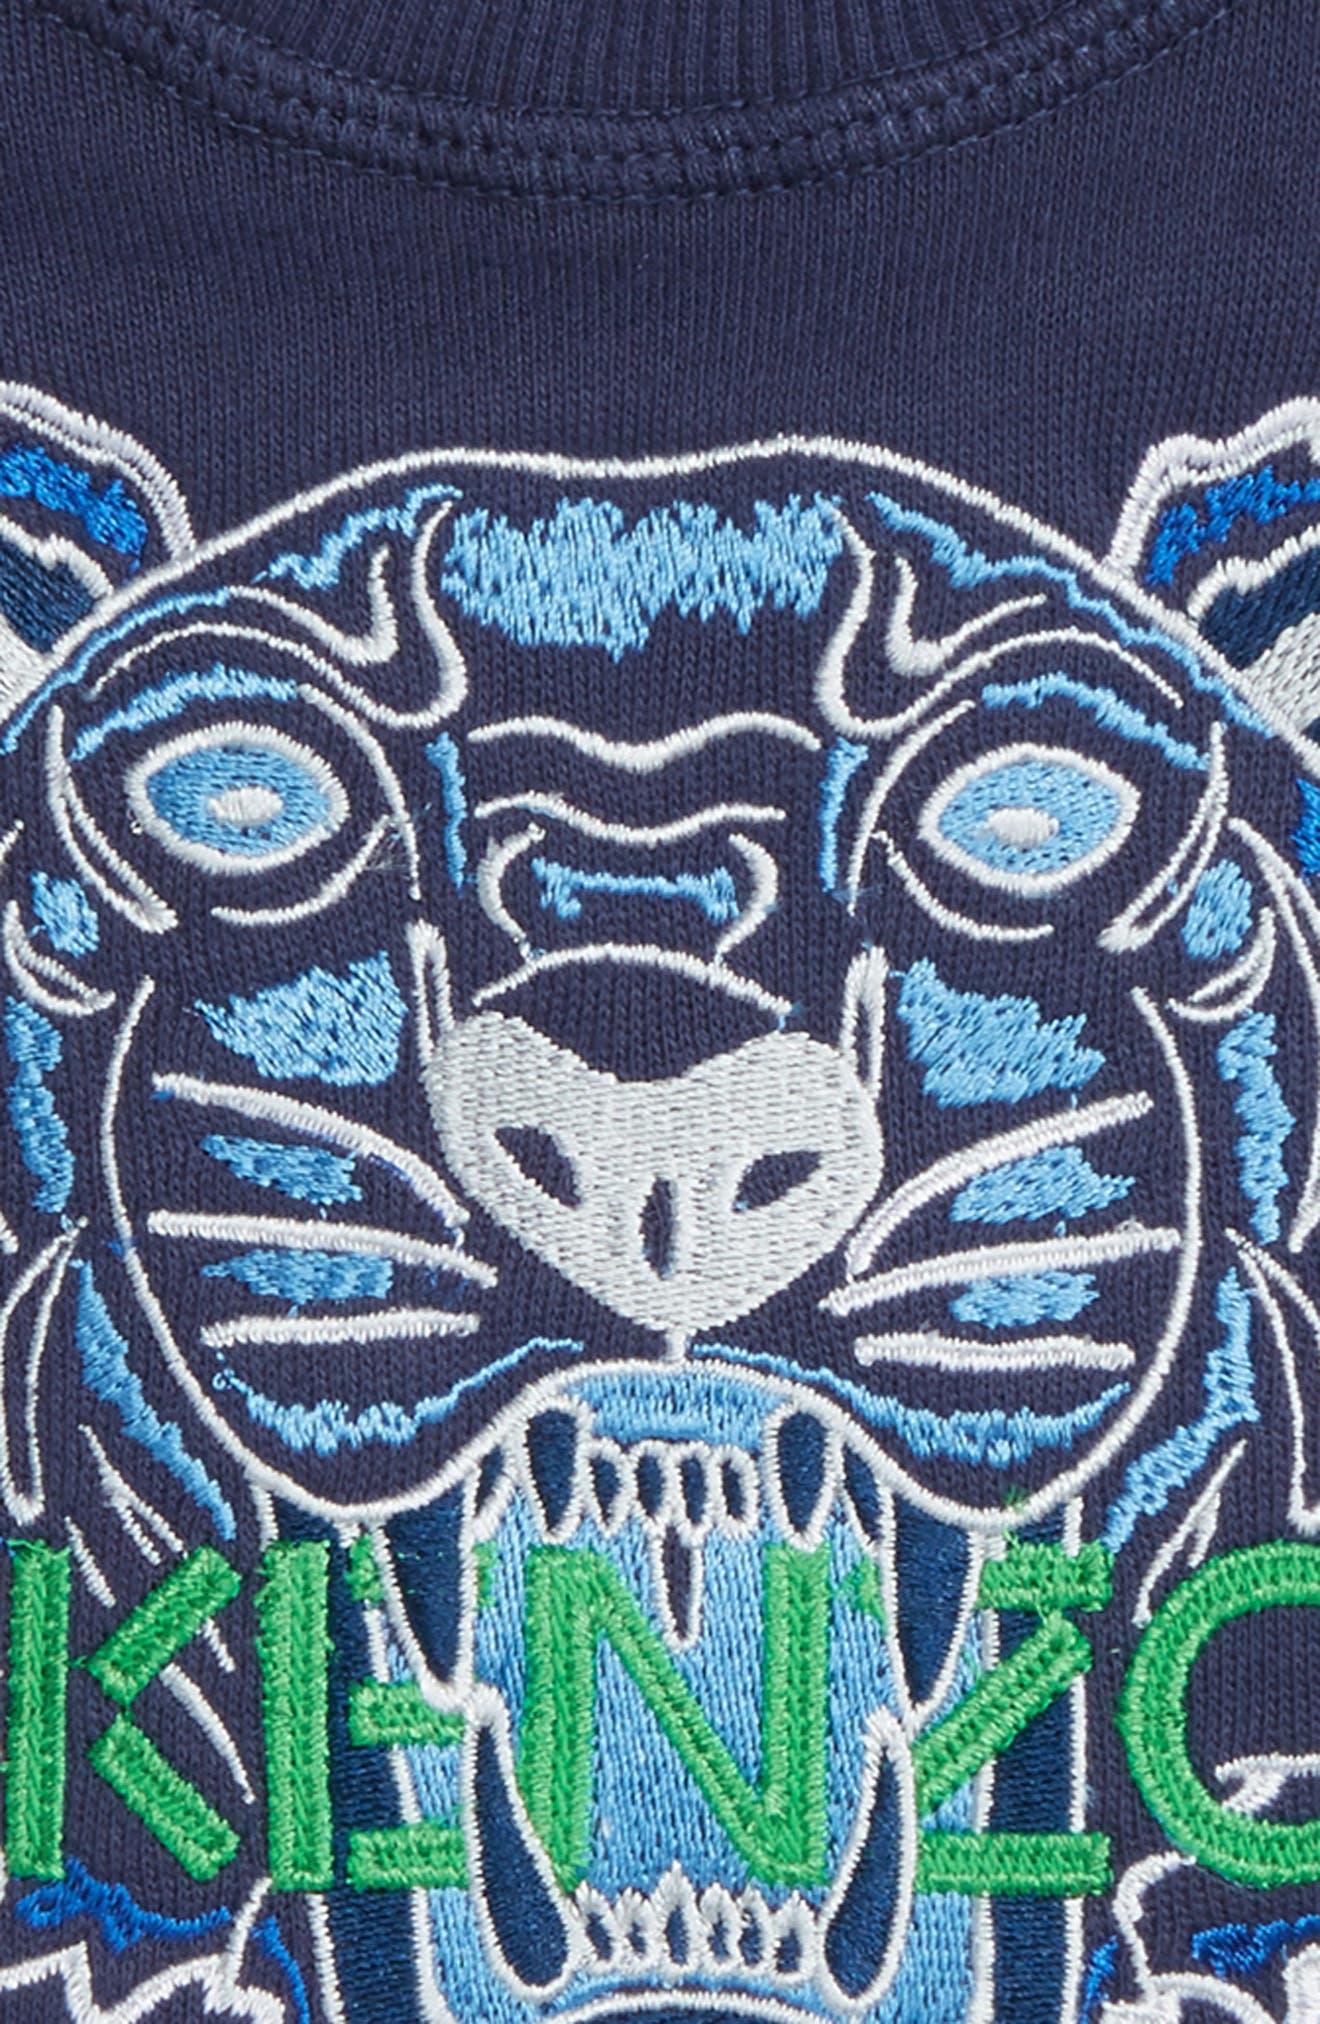 Embroidered Tiger Logo Sweatshirt,                             Alternate thumbnail 2, color,                             Navy